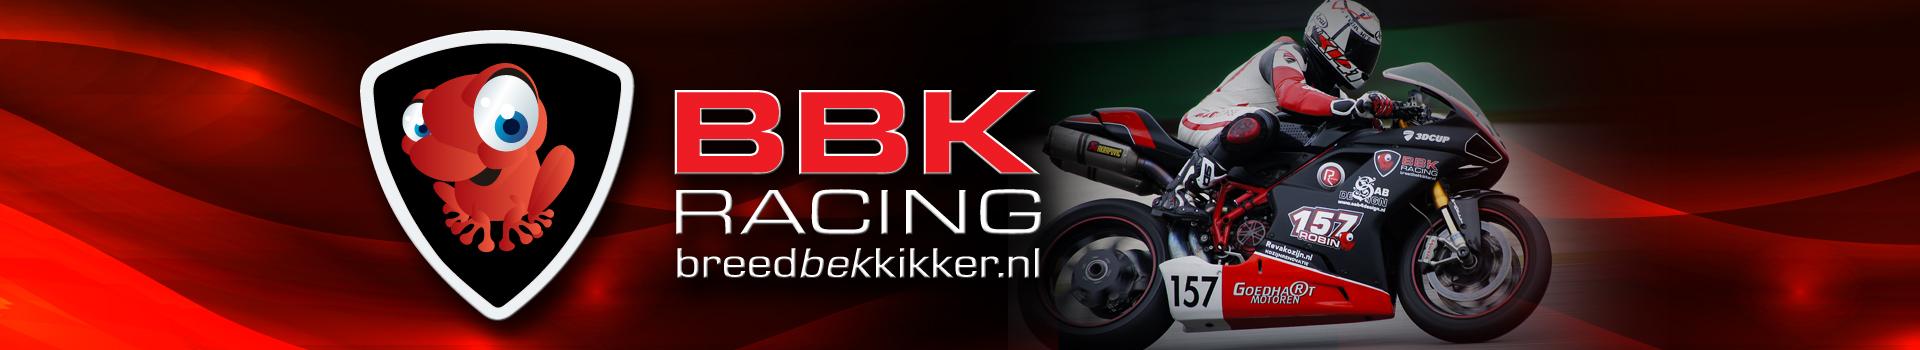 BBK Racing